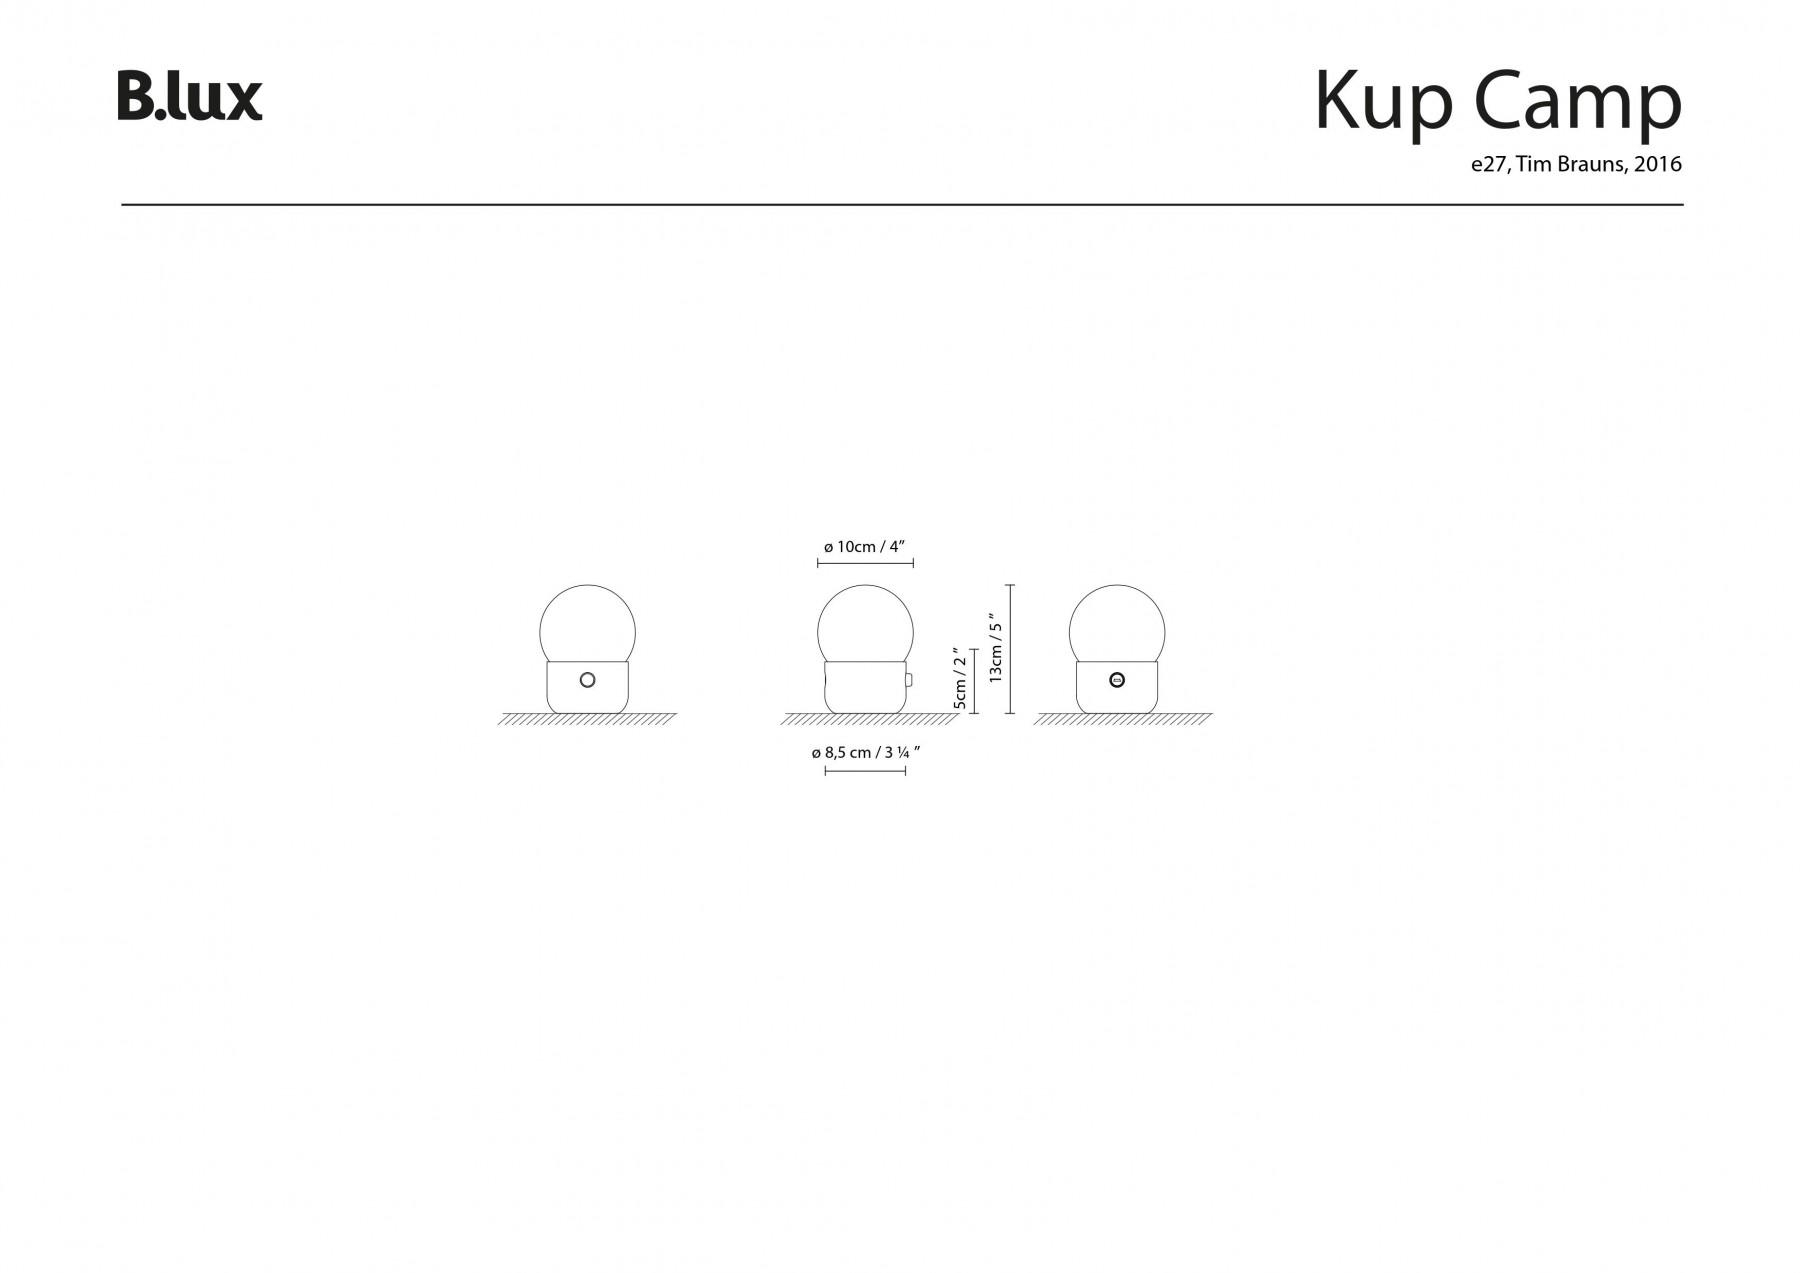 KUP CAMP BLUX